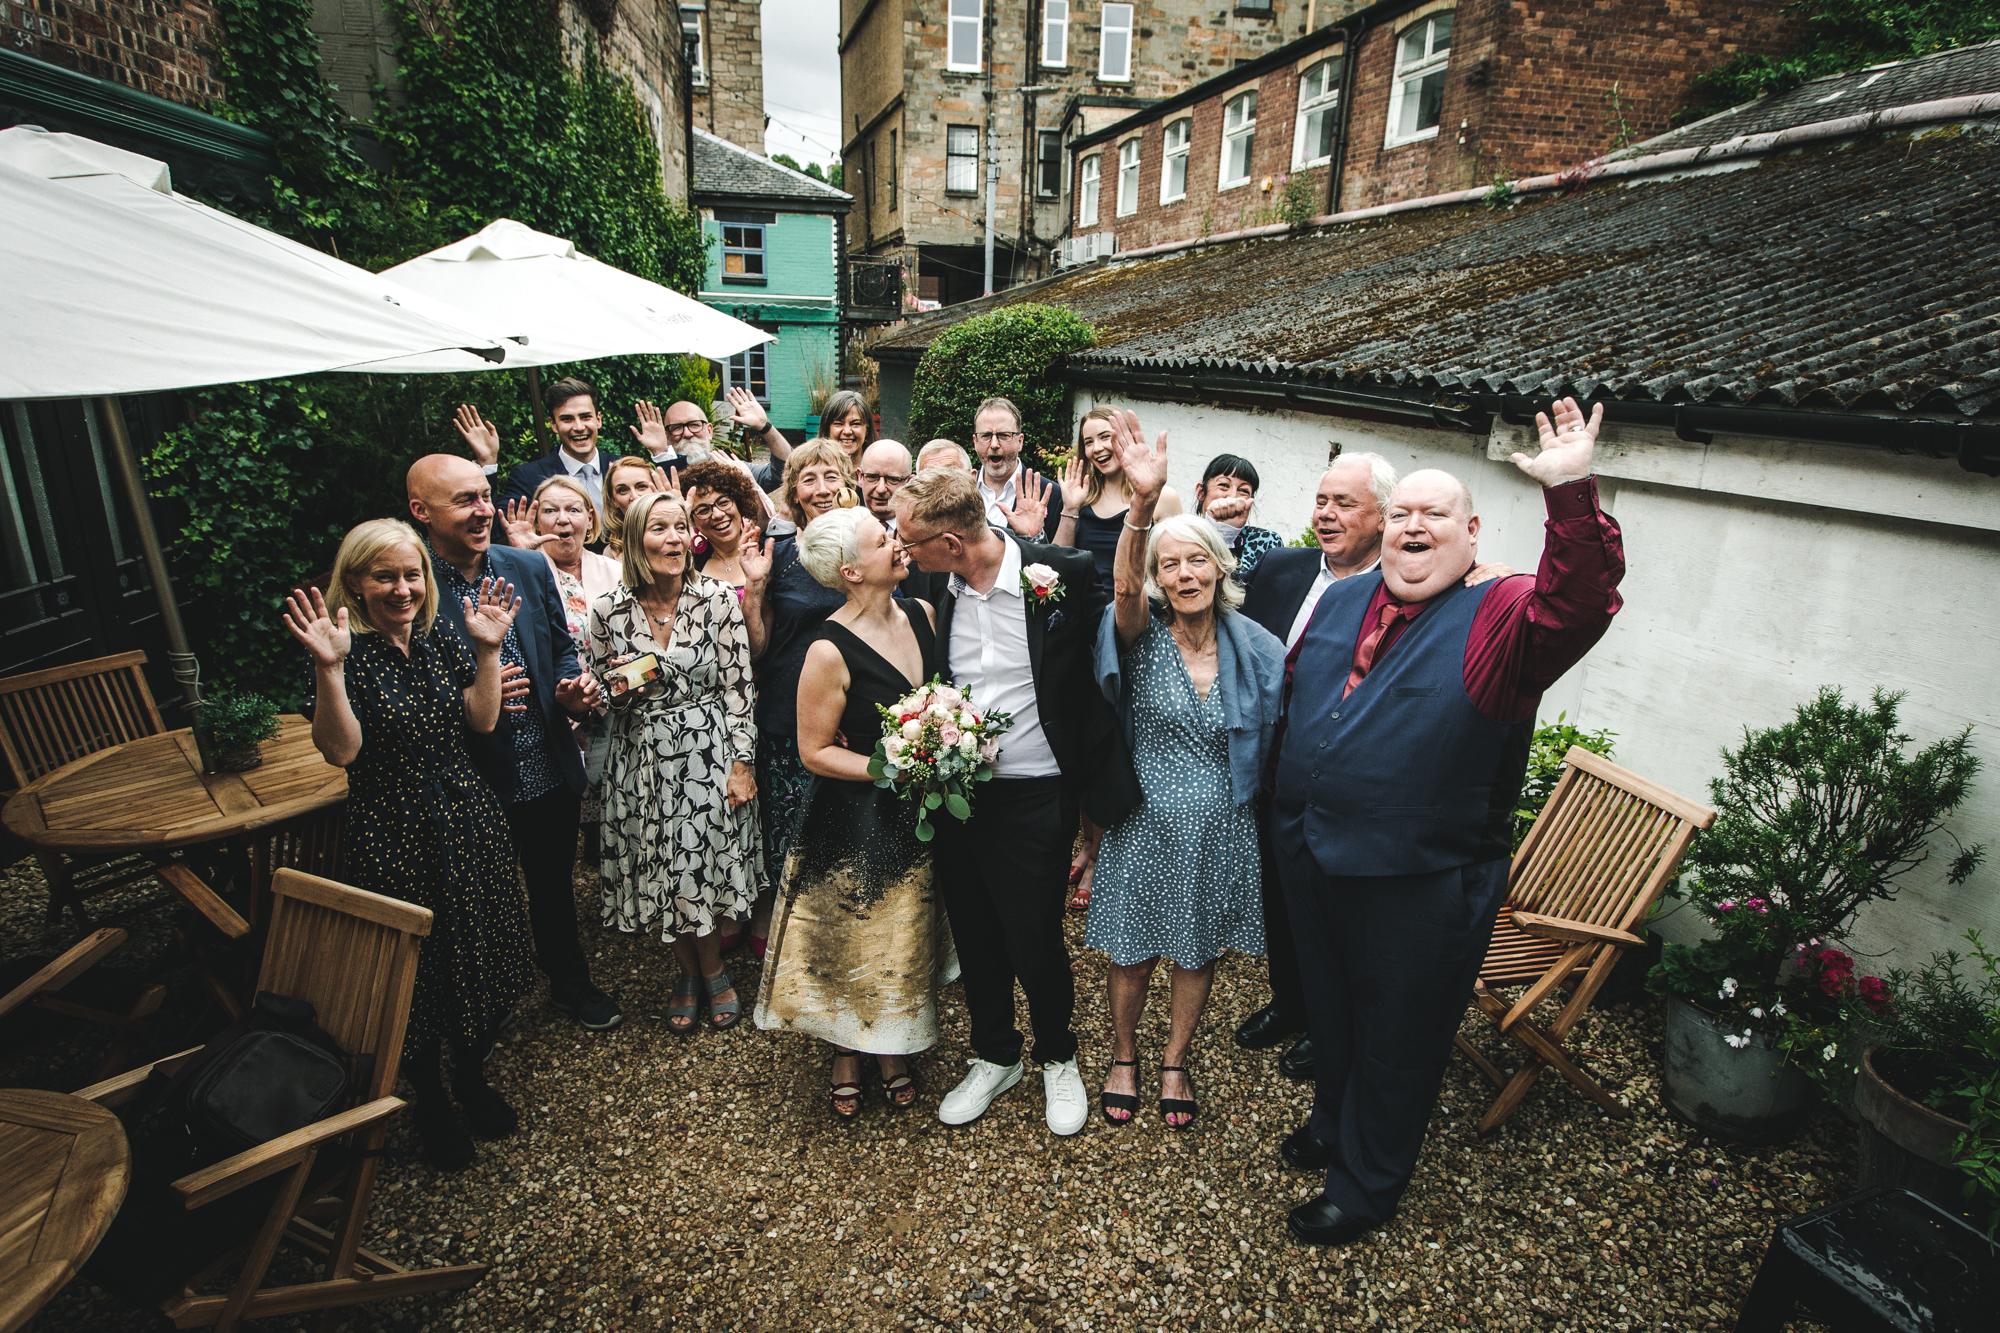 Glasgow Bothy Wedding Photographer